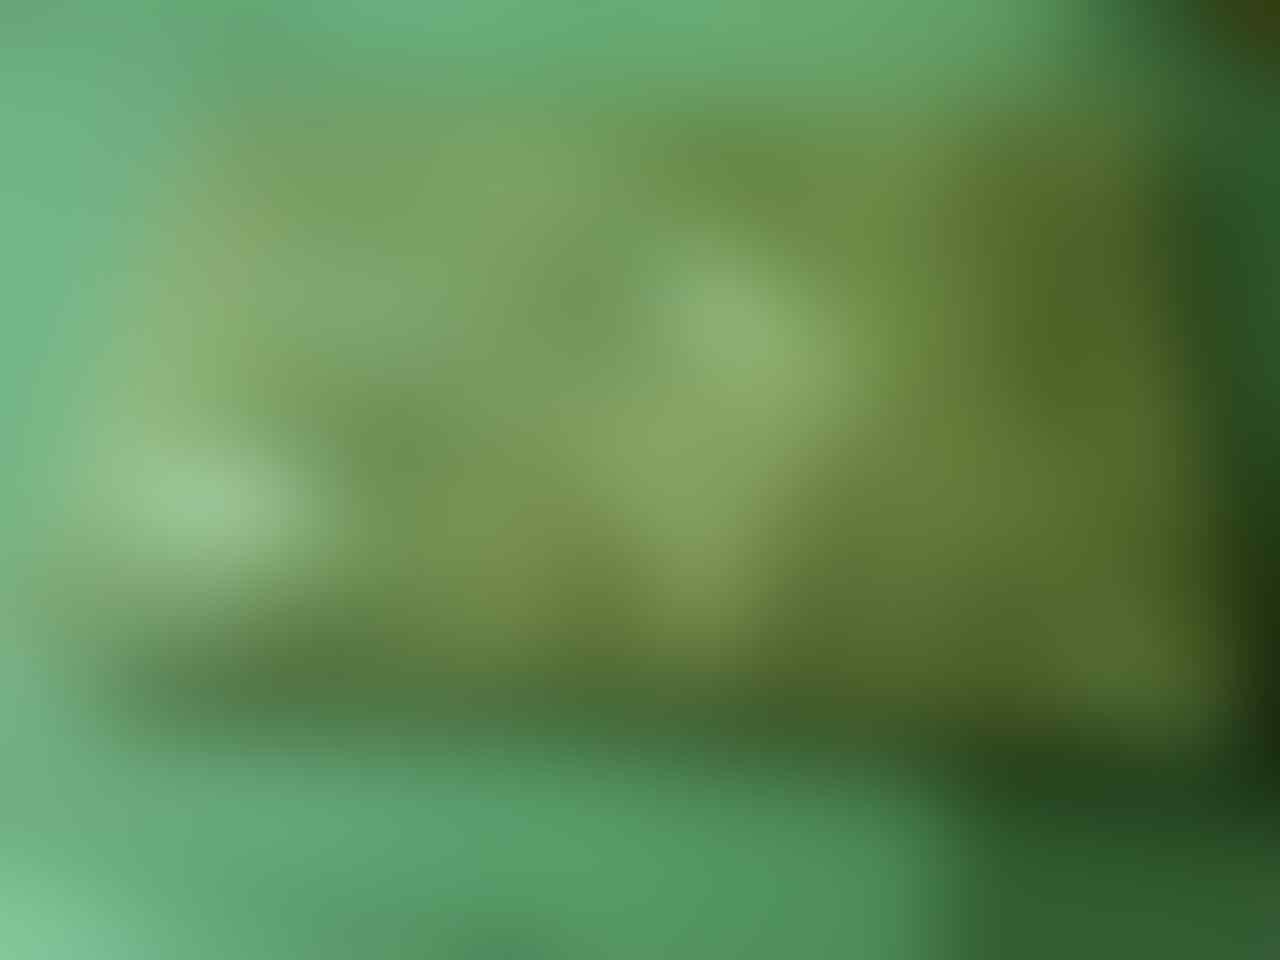 ▄▀▄PRE ORDER JERSEY GRADE ORI TERMURAH Rp 80.000 ! KUALITAS 100% GRADE ORI ! ▄▀▄